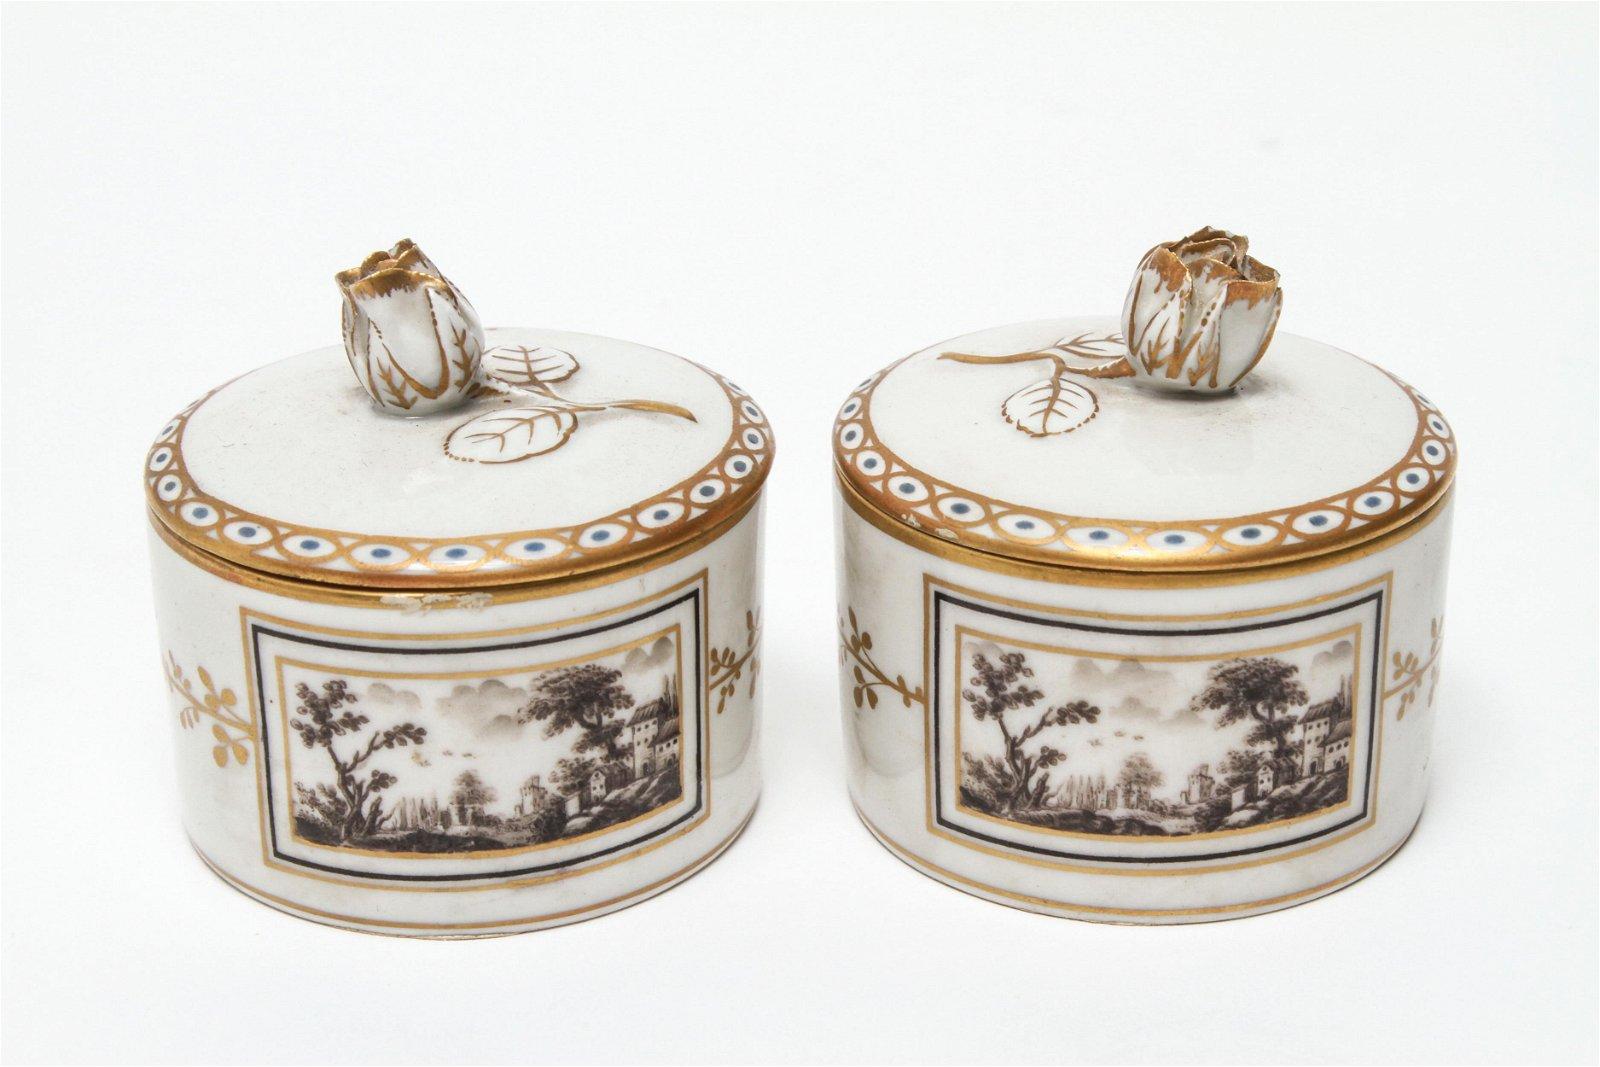 Richard Genori Rose Lidded Porcelain Boxes Group 2